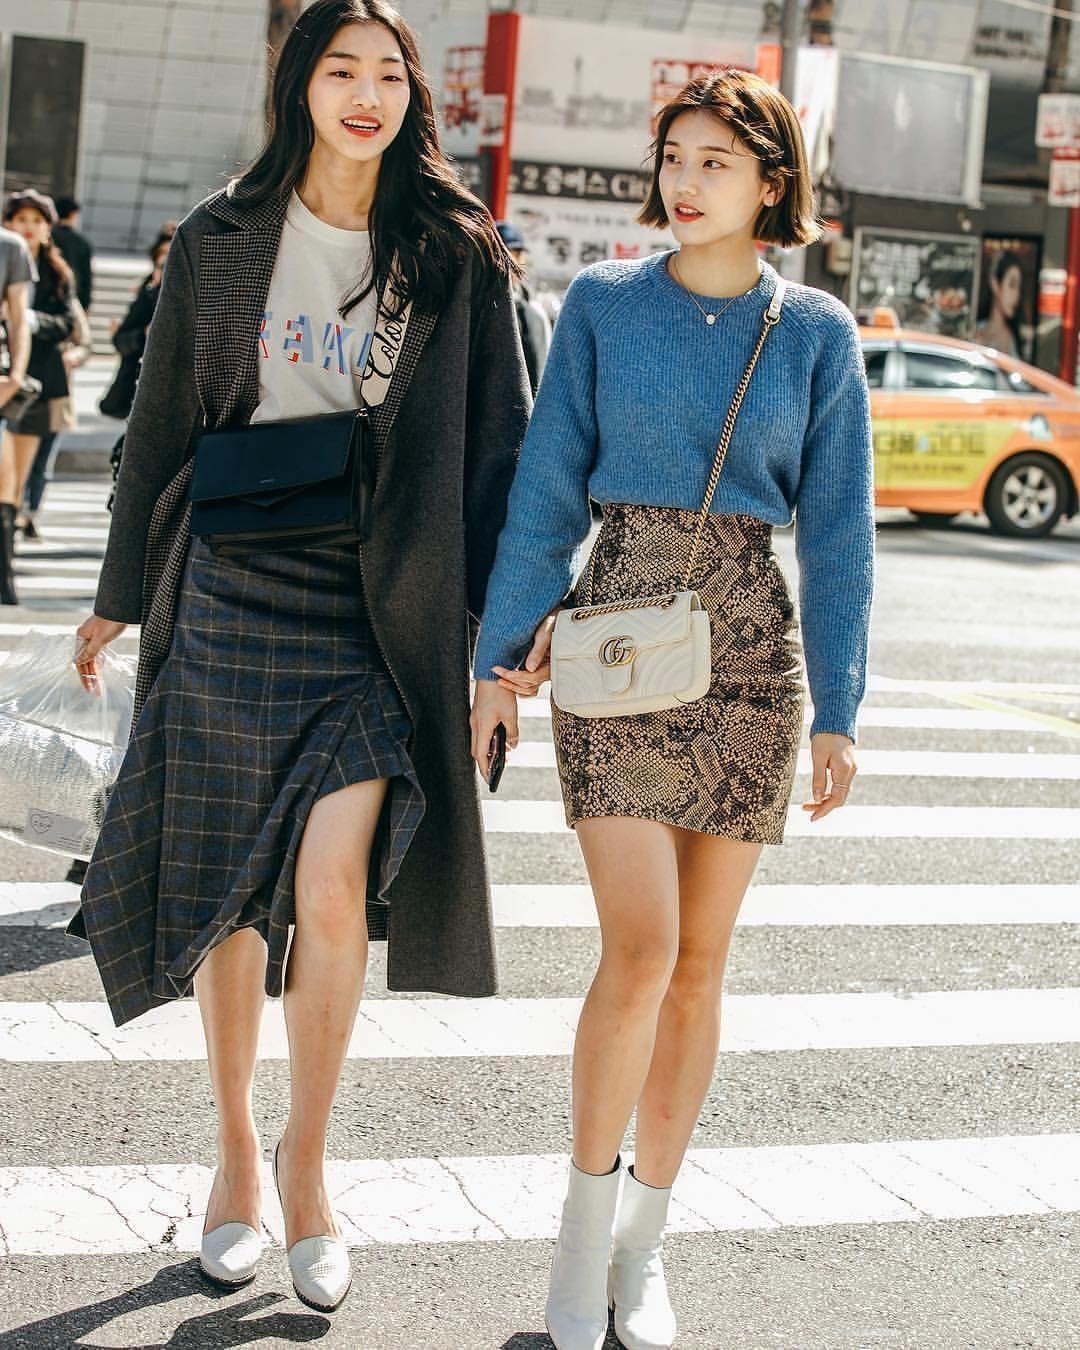 Jenis-jenis Tas Mini yang Lagi Trend di Kalangan Fashionista